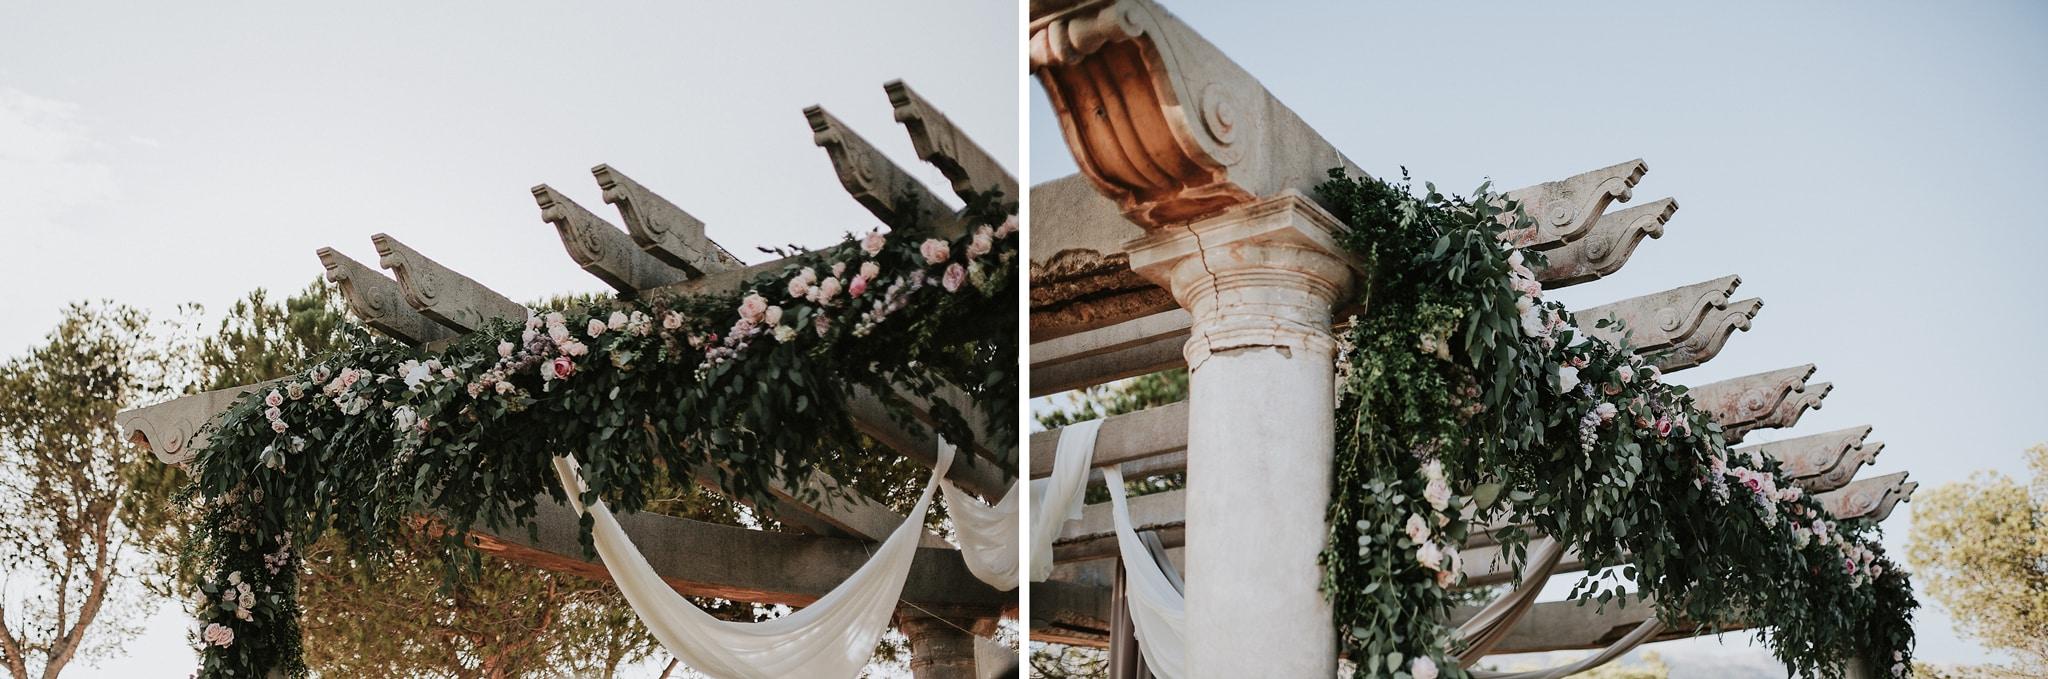 fotografo-bodas-altea-57